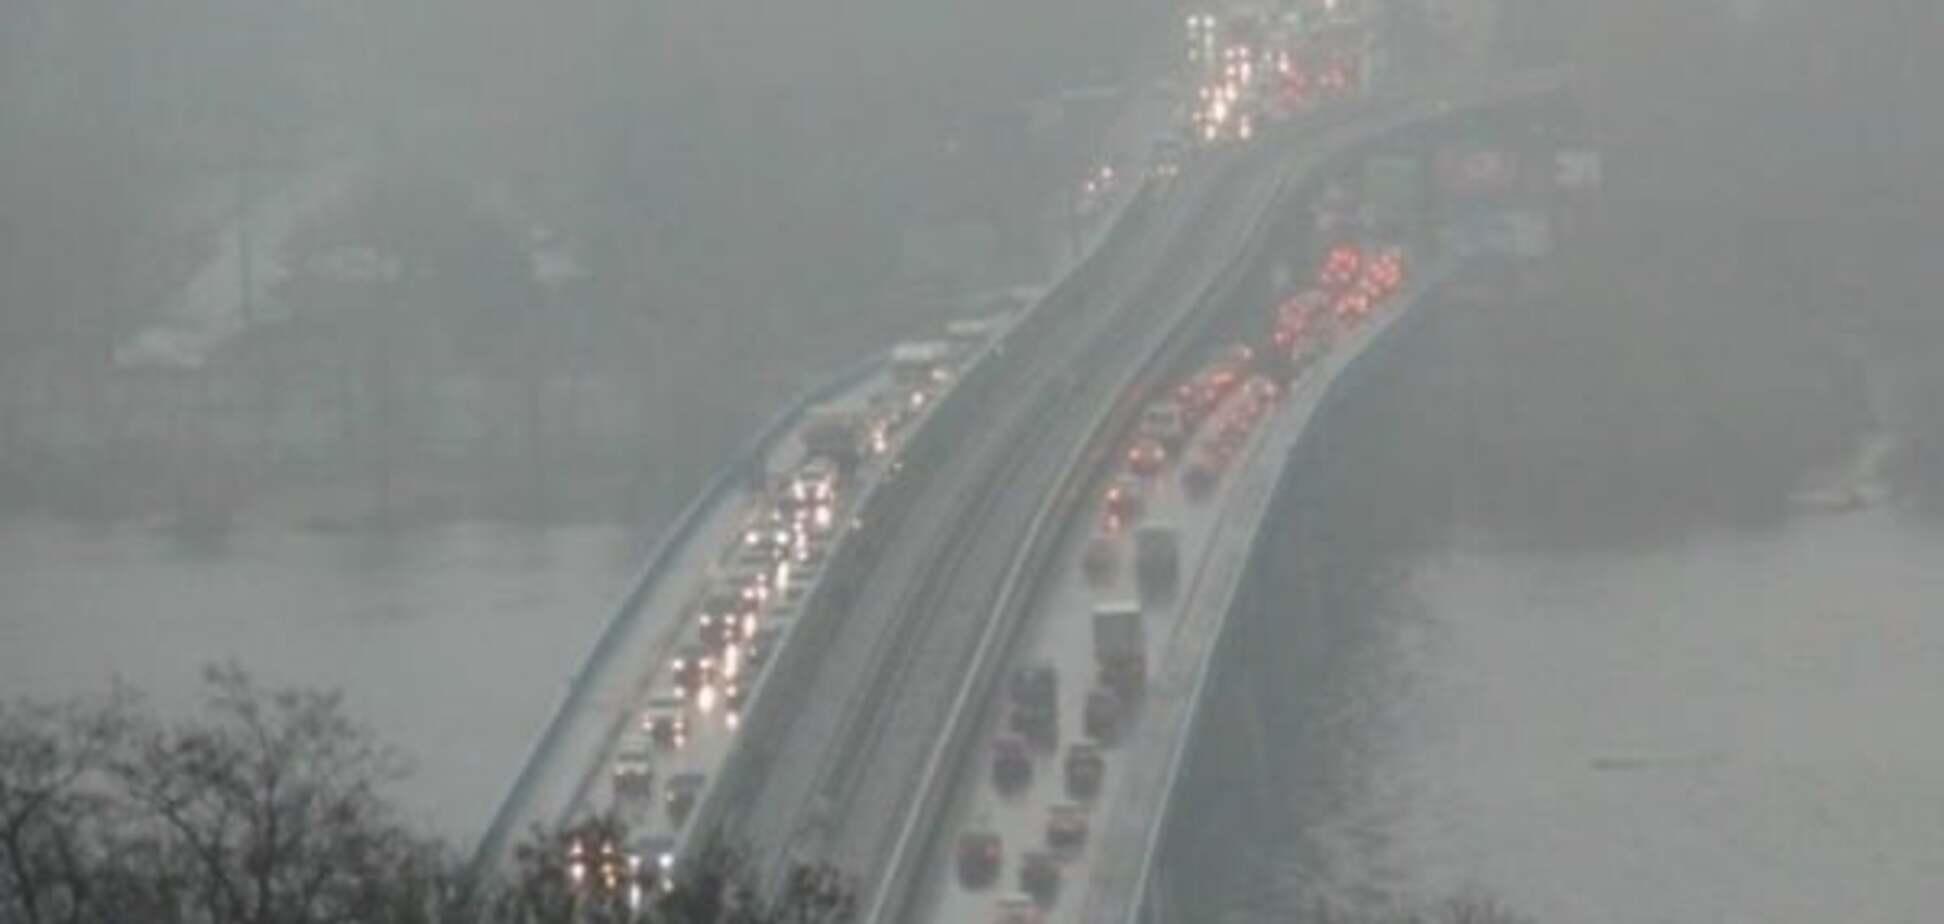 Київ накриє туманом: у КМДА попередили водіїв